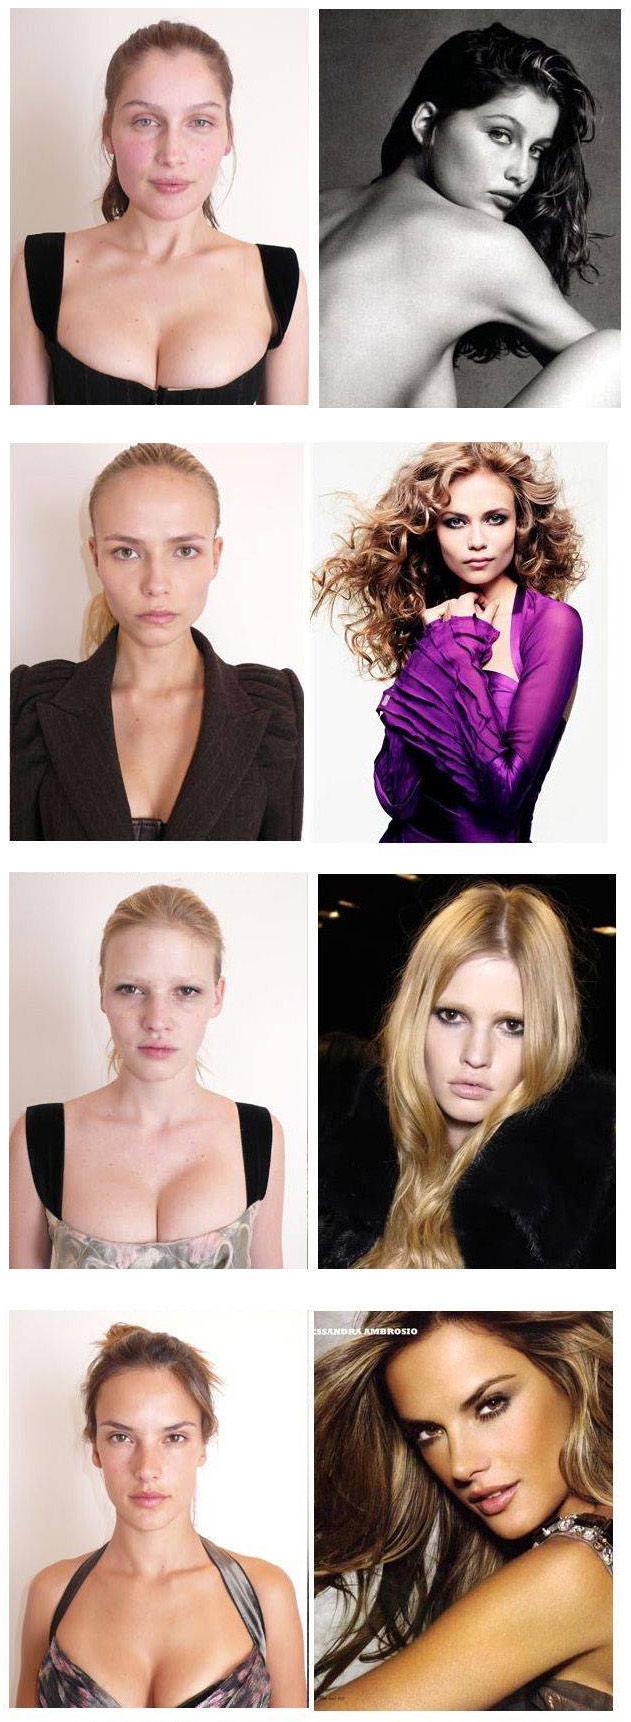 Models Ziehen Blank